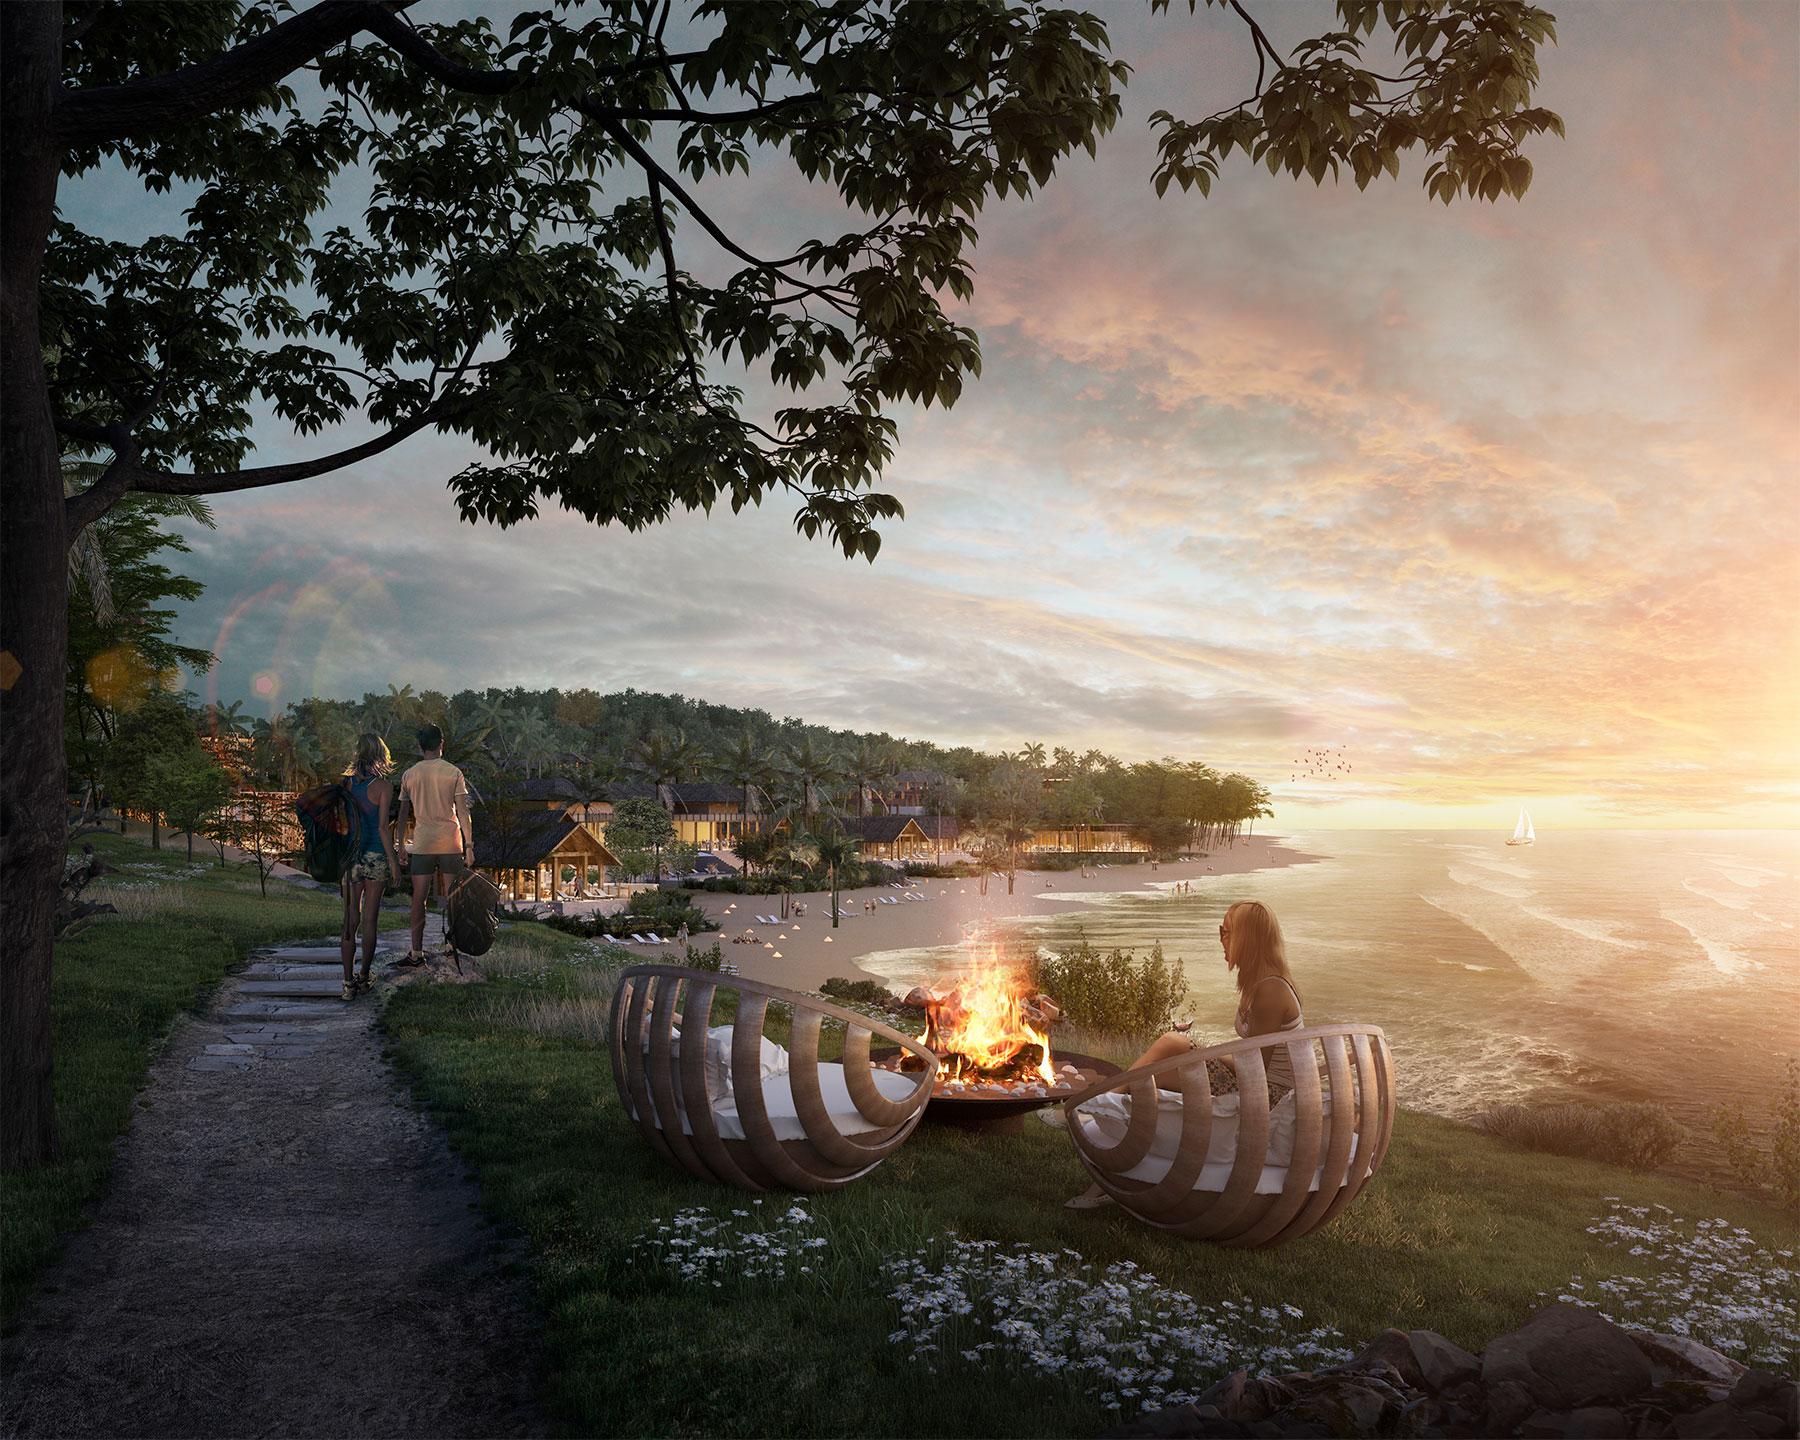 render of sunset resort in forest